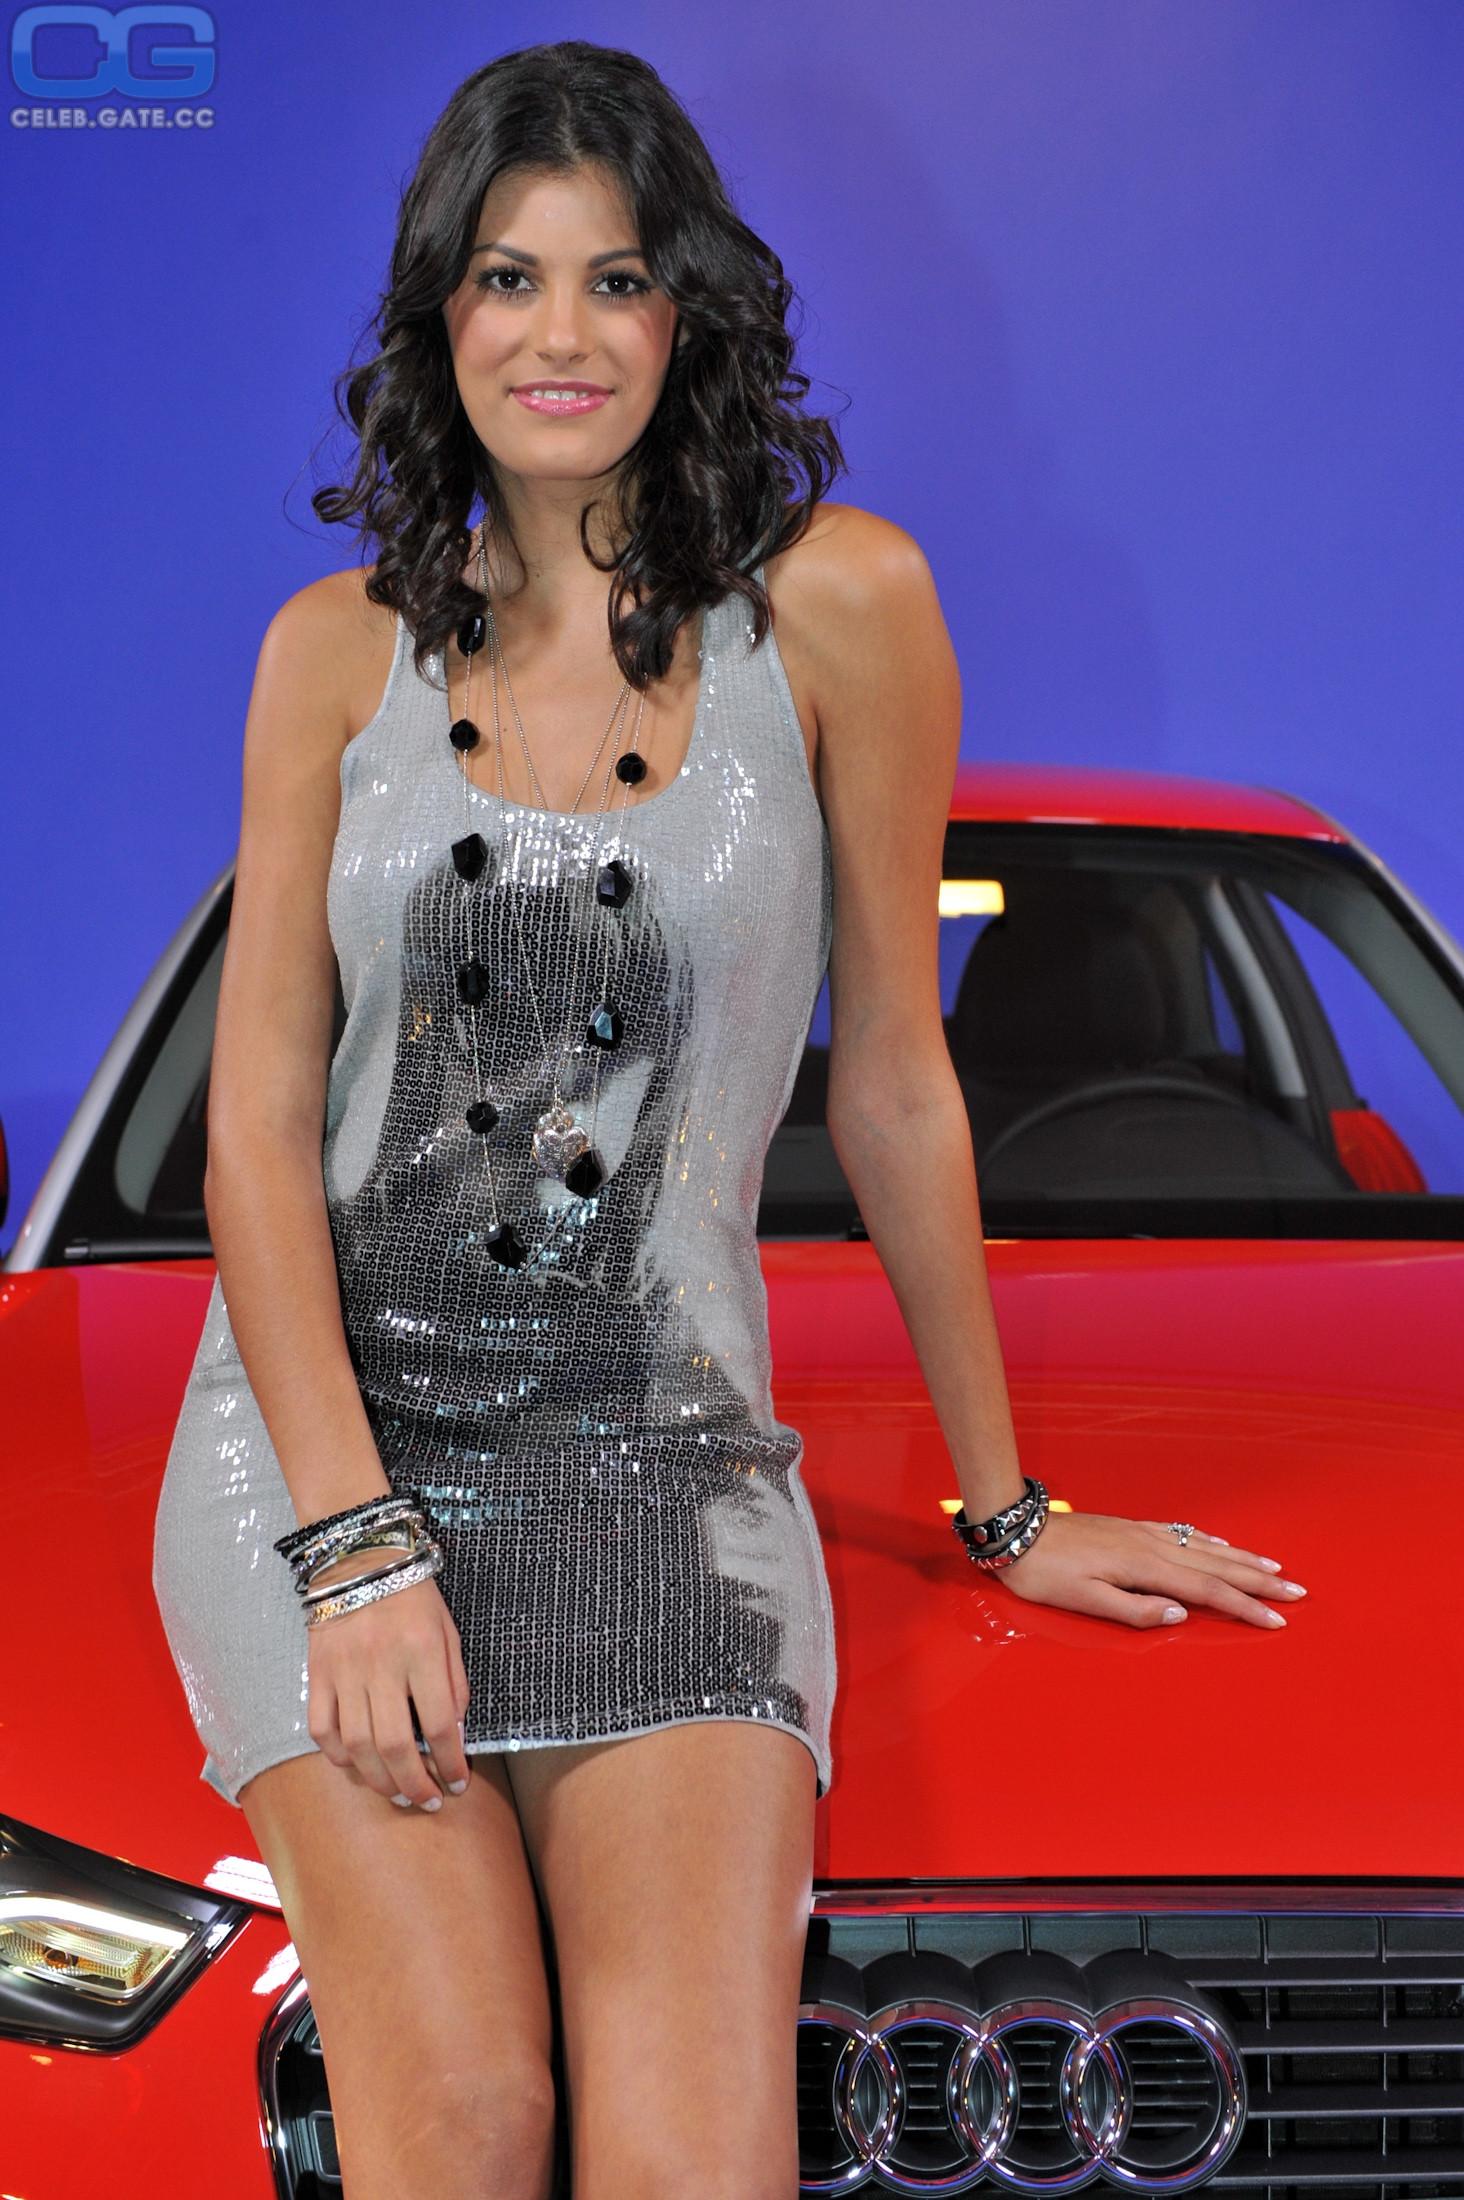 Nackt  Alisar Ailabouni rental bubble: